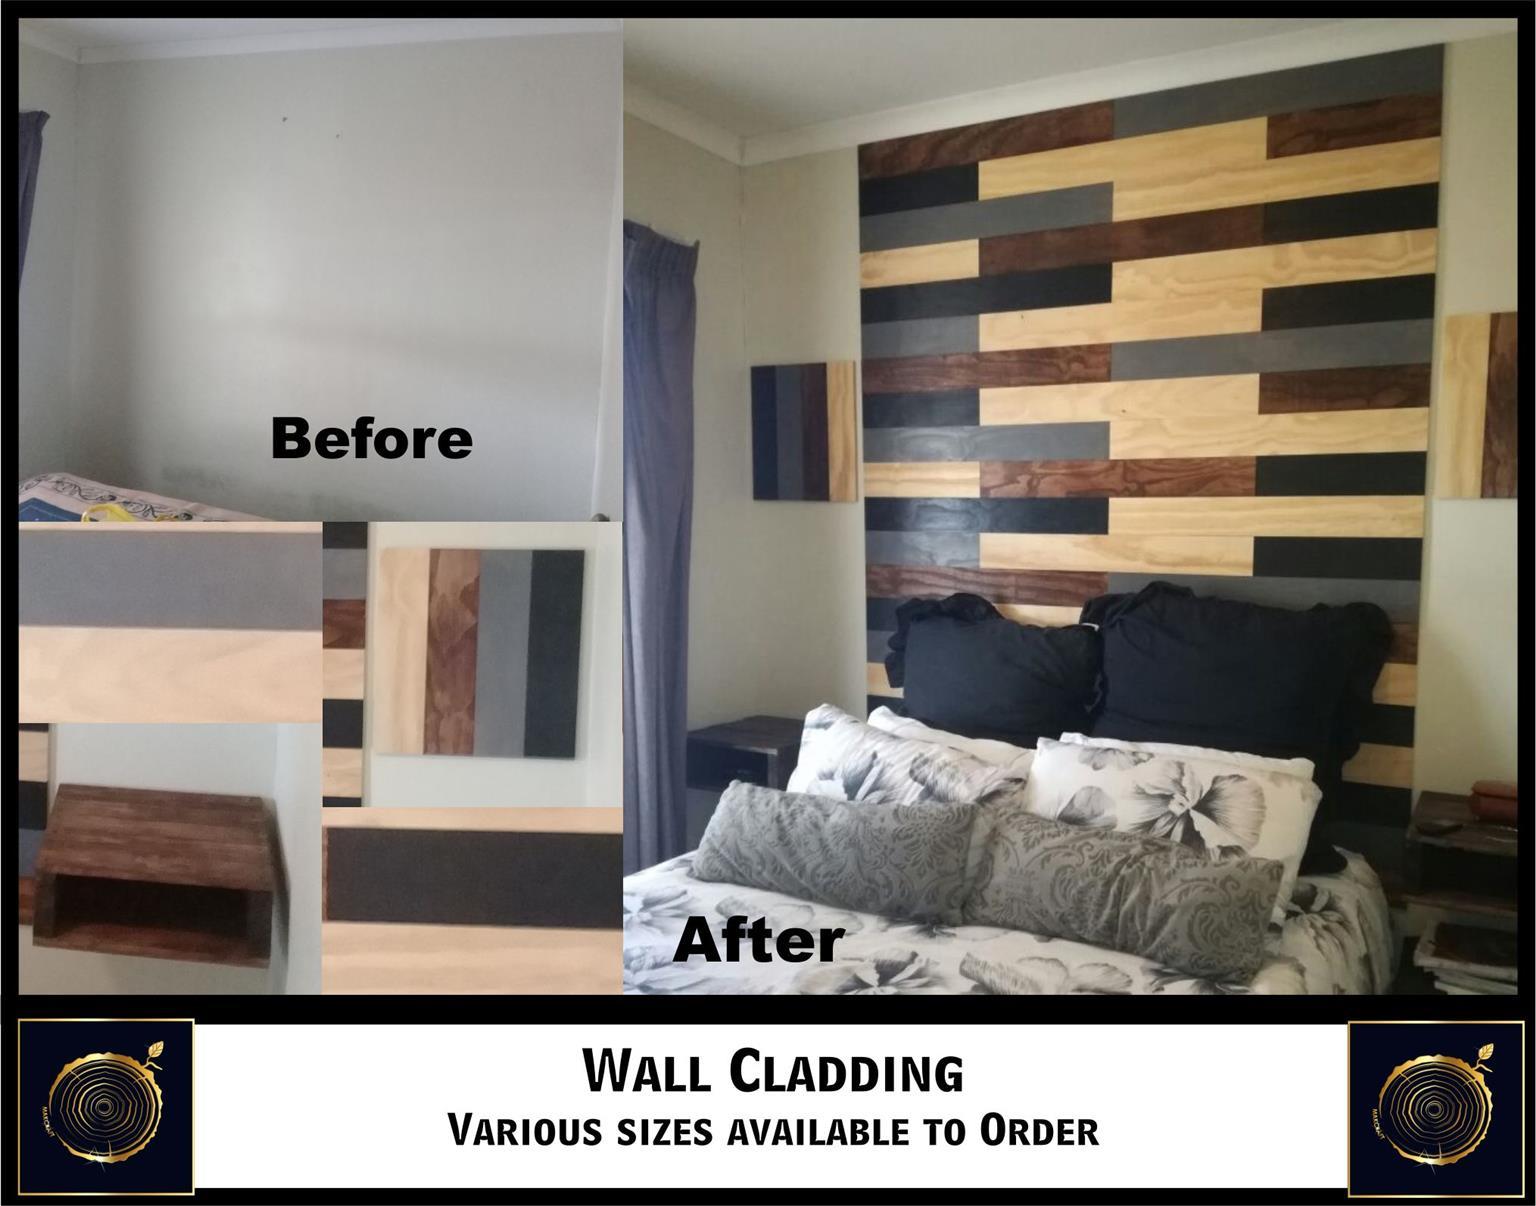 Wall Cladding & Decoration